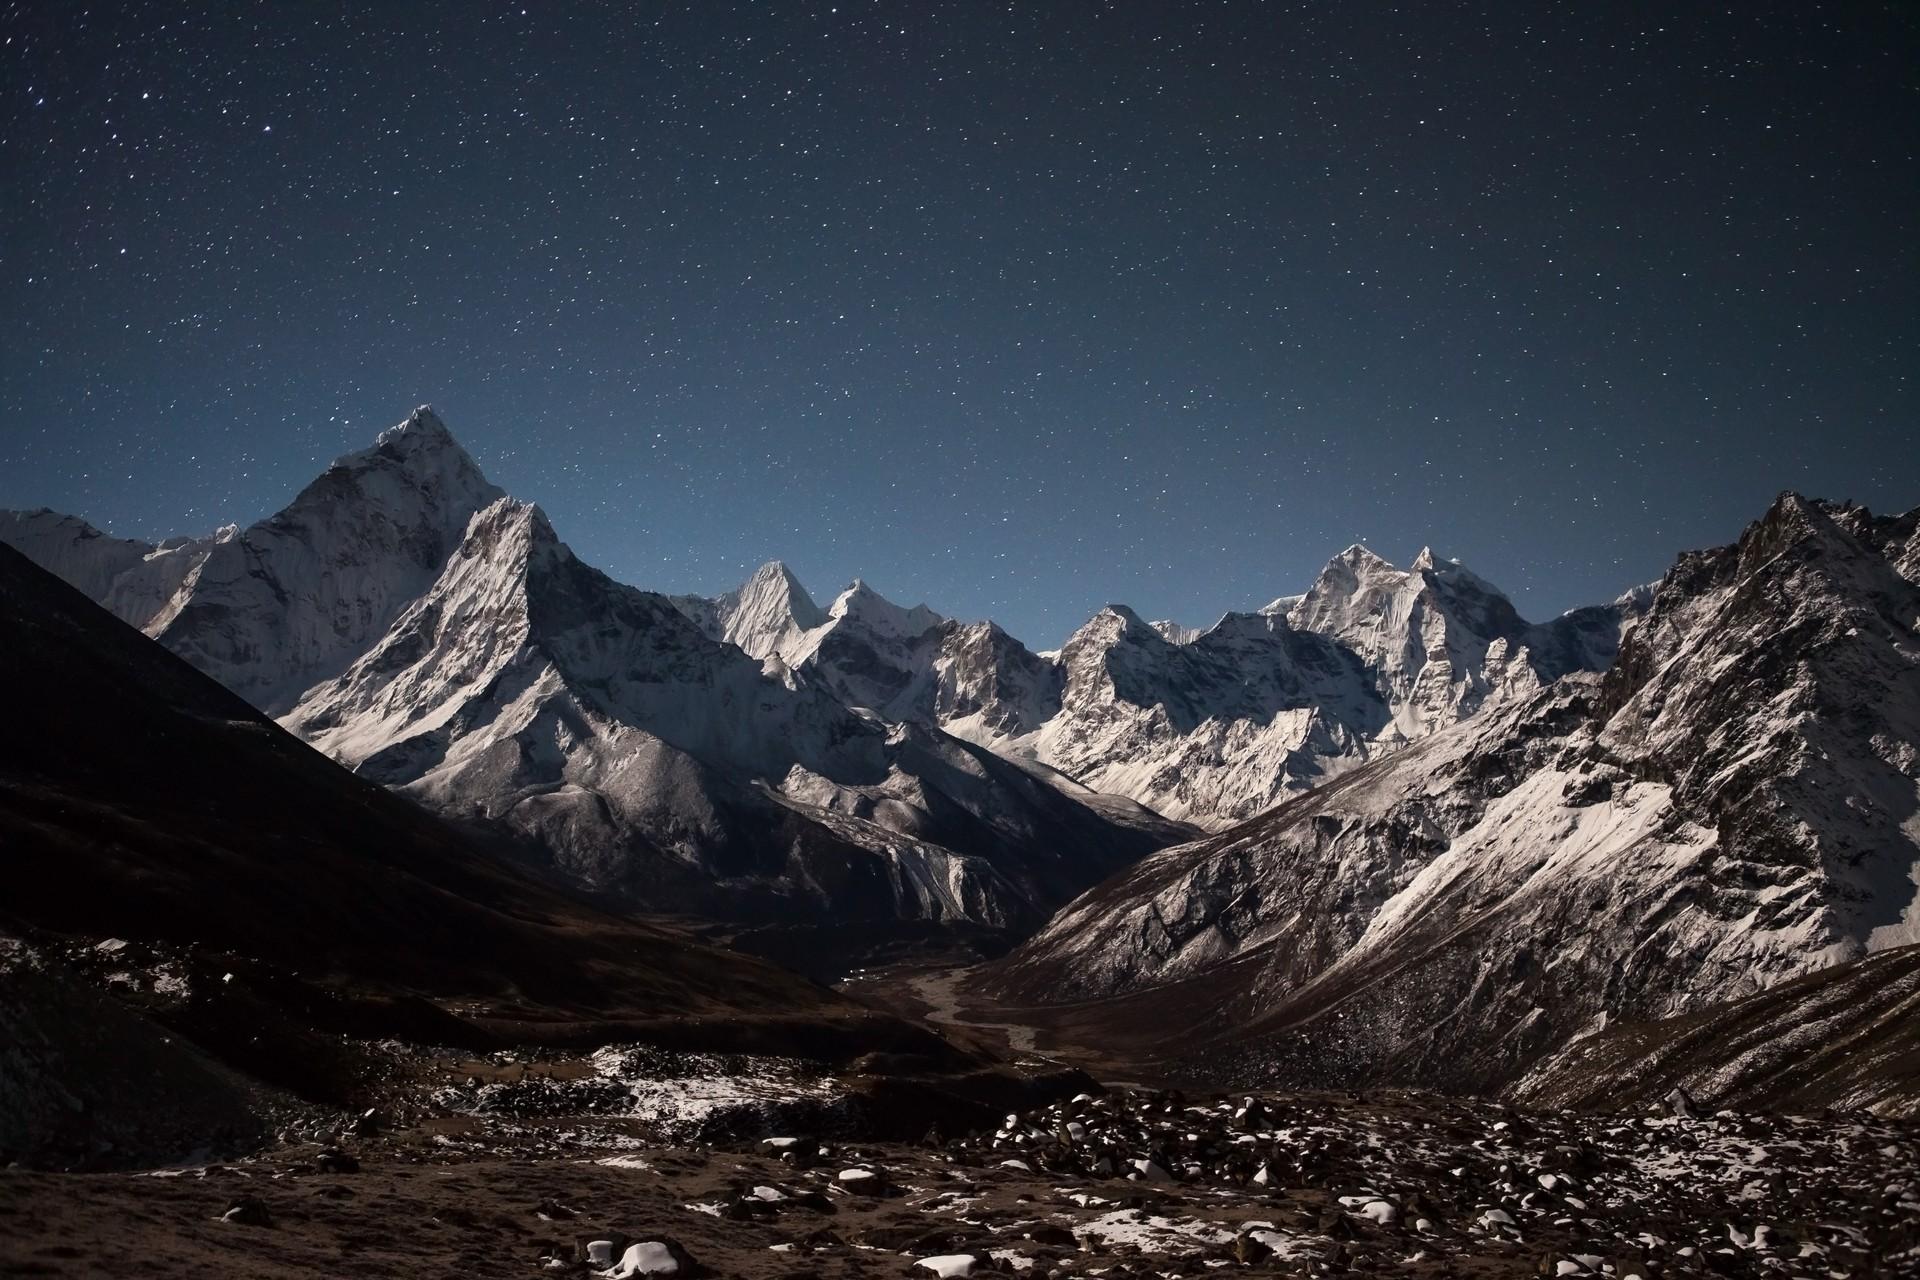 The starry night sky over Sagarmatha National Park, Nepal